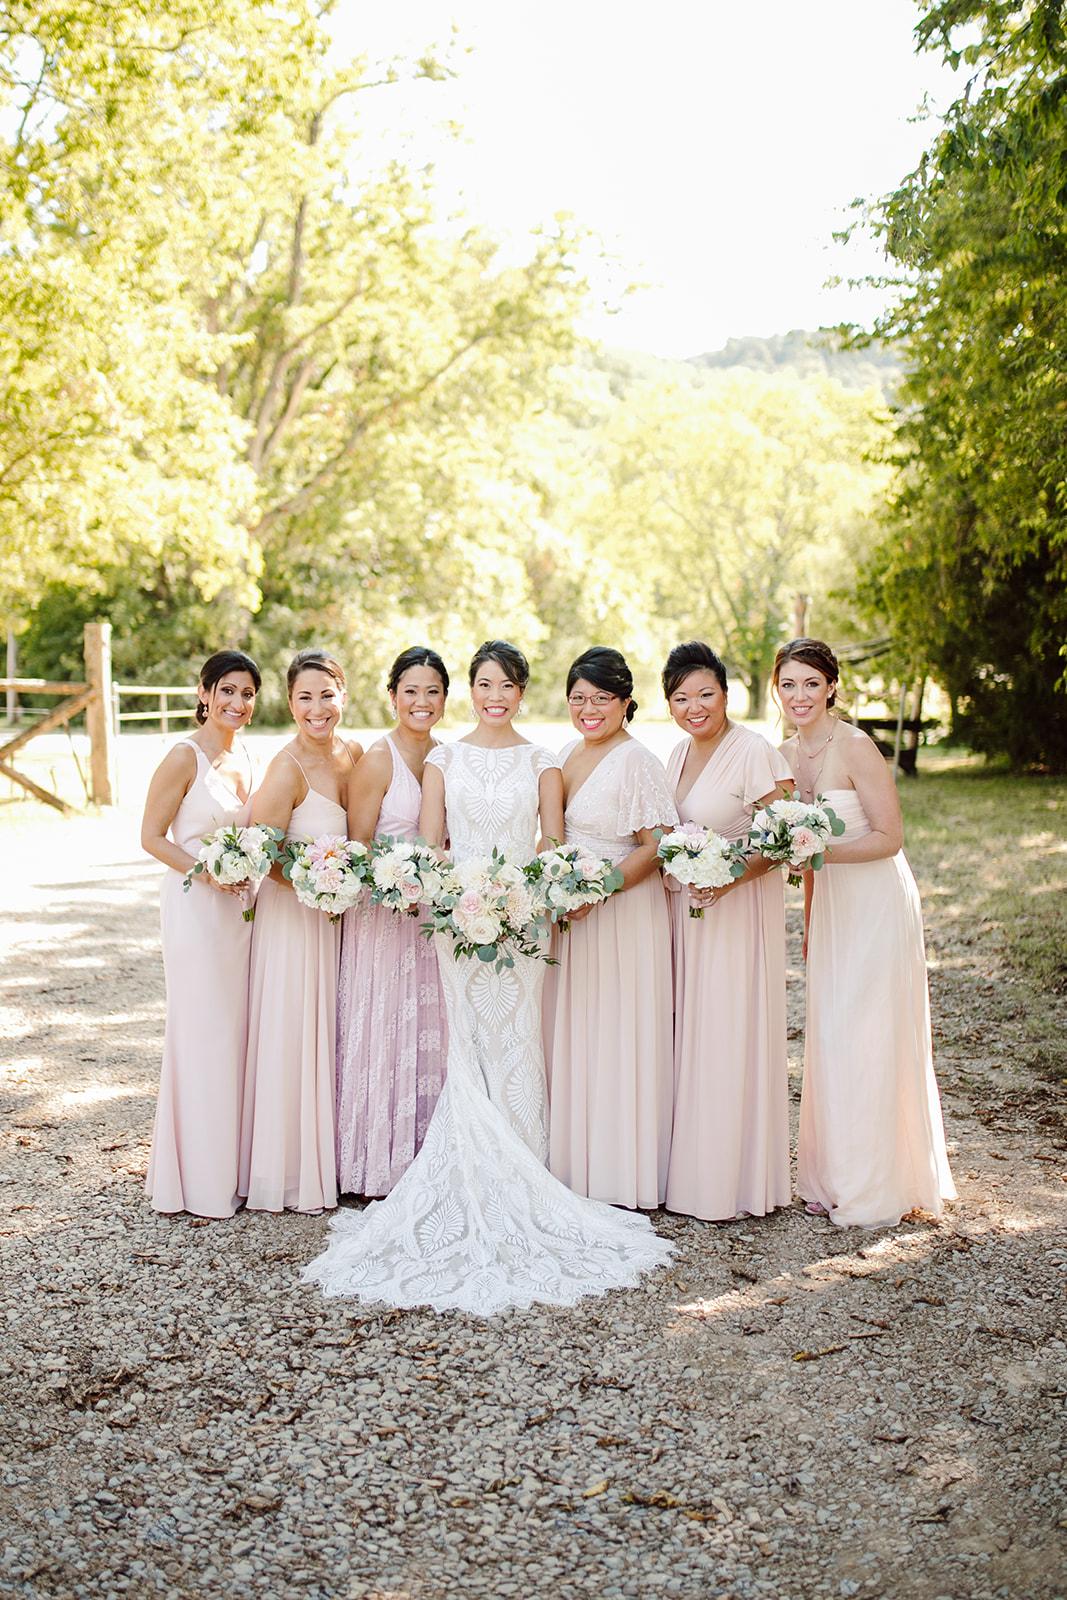 Long pink bridesmaids dresses